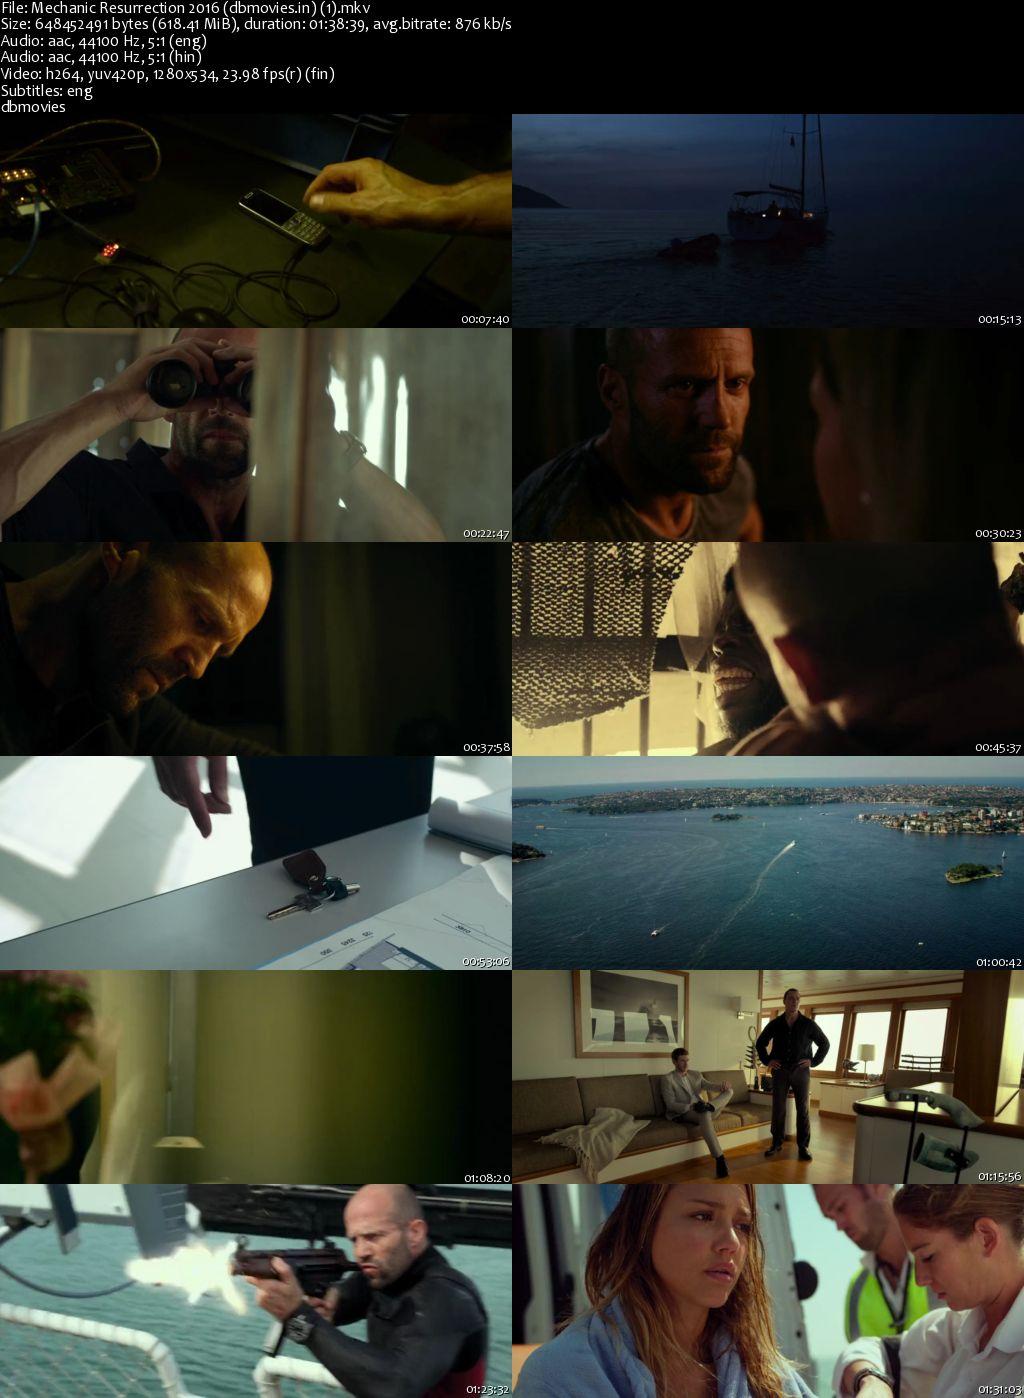 screen shot Mechanic Resurrection 2016 Full Movie Download Dual Audio 720p